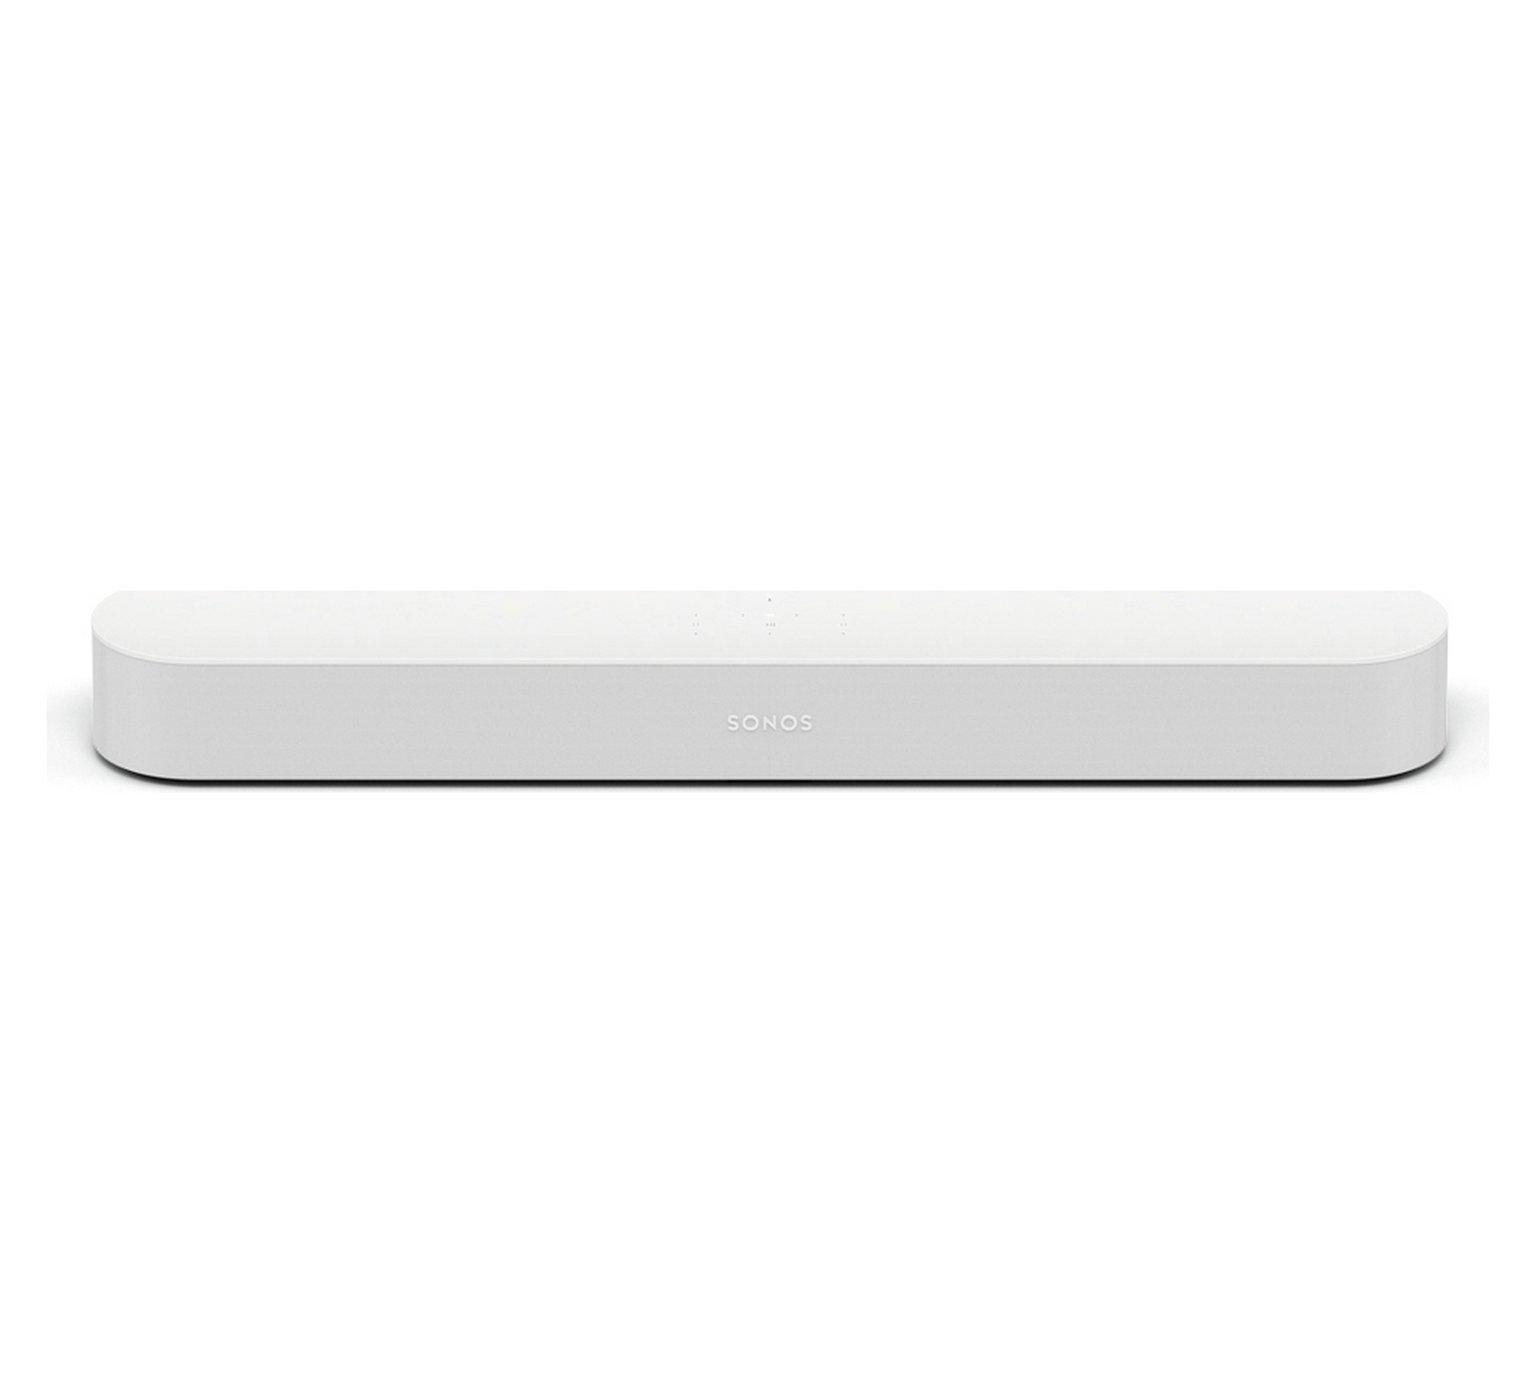 Sonos Beam Compact Smart Sound Bar - White